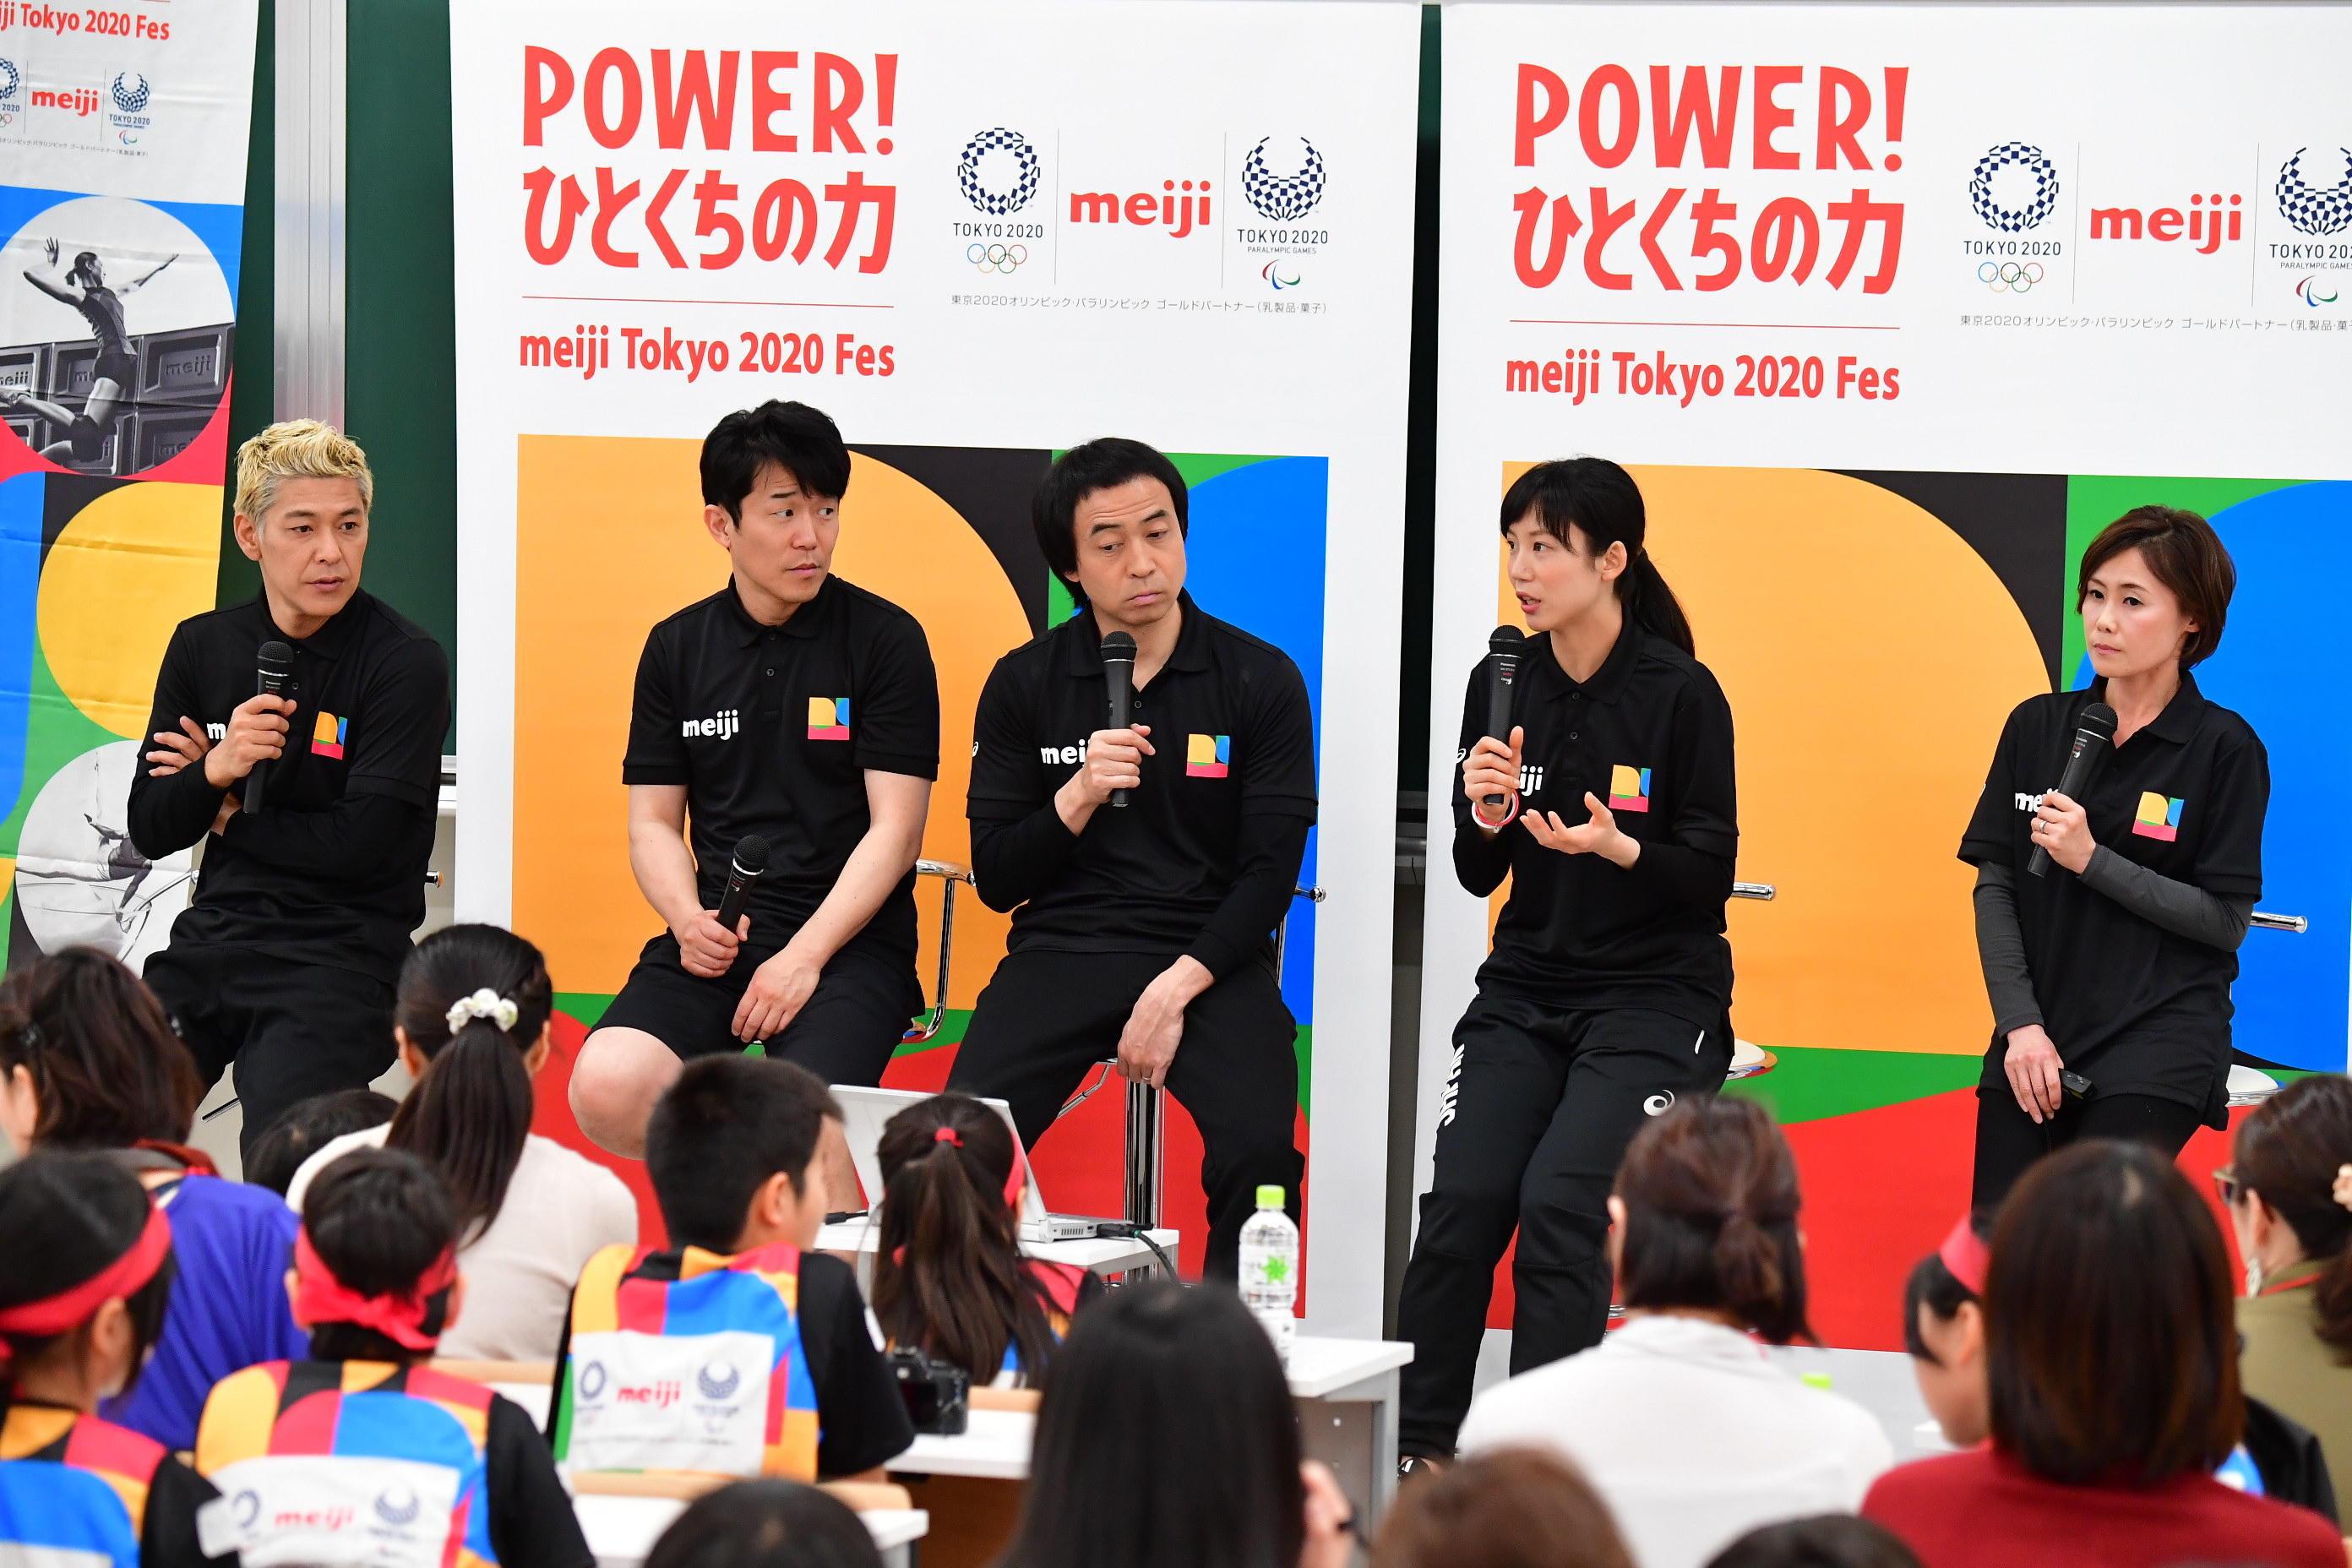 http://news.yoshimoto.co.jp/20180331010216-1f7931400cc807f0851d6c9c1ece34616705085b.jpg